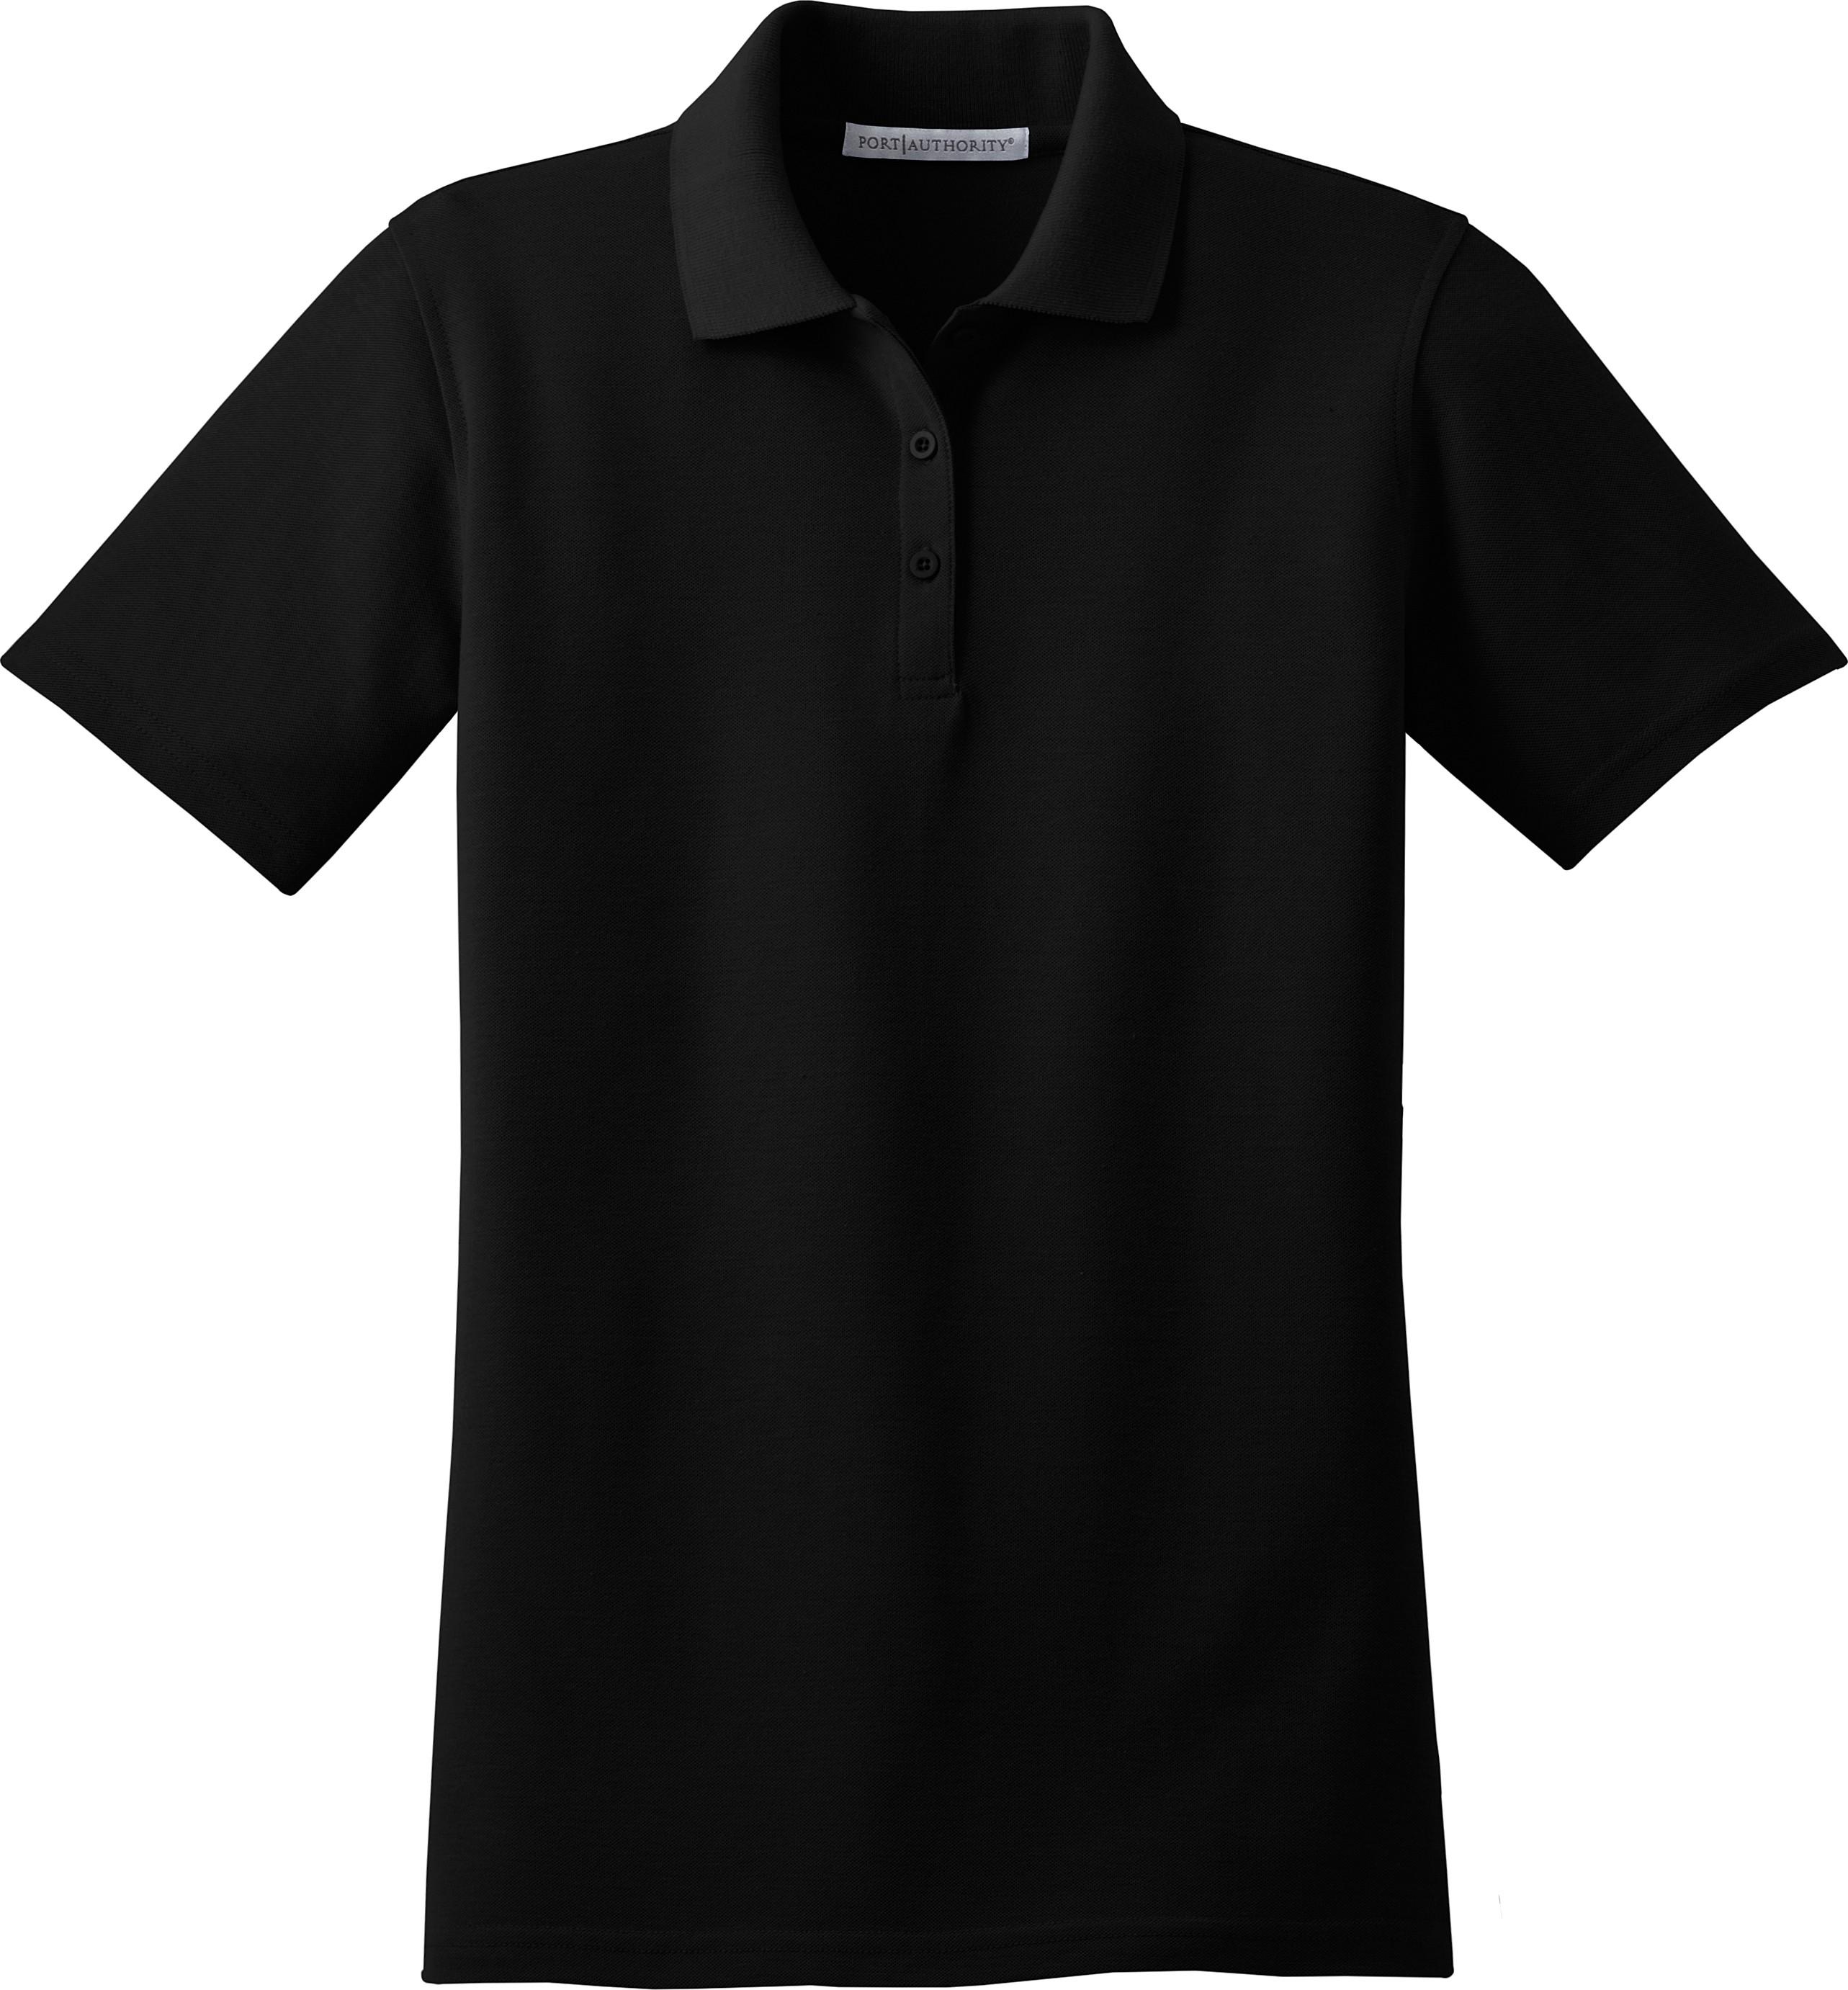 Black t shirt template psd - Polo Shirt Template Psd Business Proposal Presentation Template